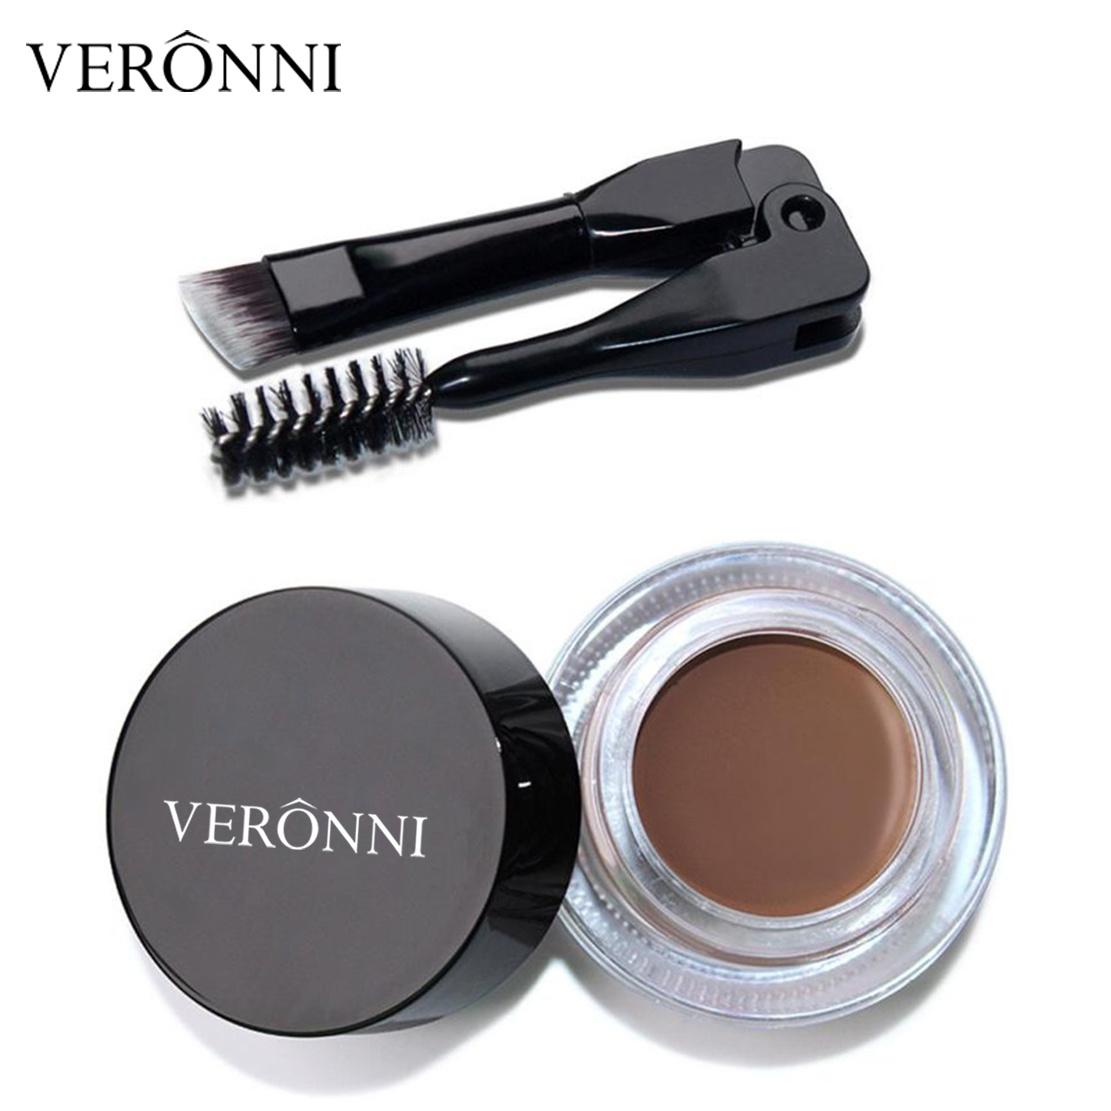 0027bc94b248 [Hot Item] 8 Colors Eye Brow Cream Tint Makeup Tool Kit Long Lasting  Waterproof Eyebrow Gel with Brow Brush Cosmetic Set